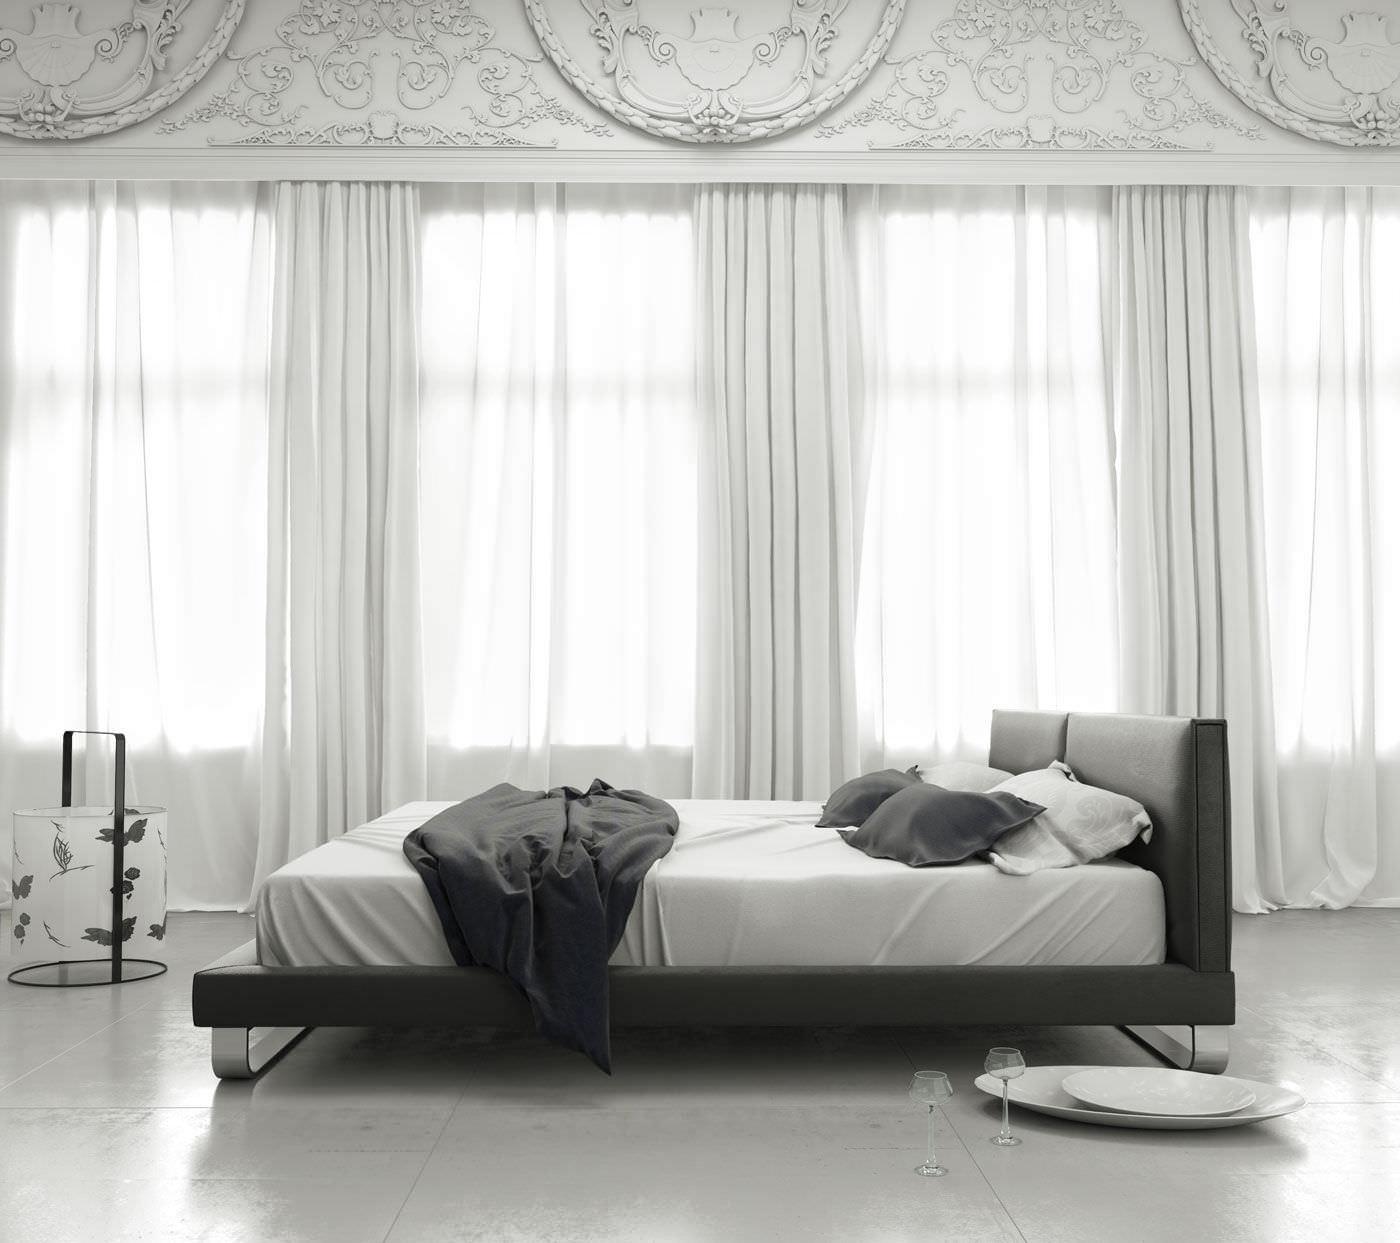 Cama estándar / de matrimonio / moderna / con cabecero tapizado ...